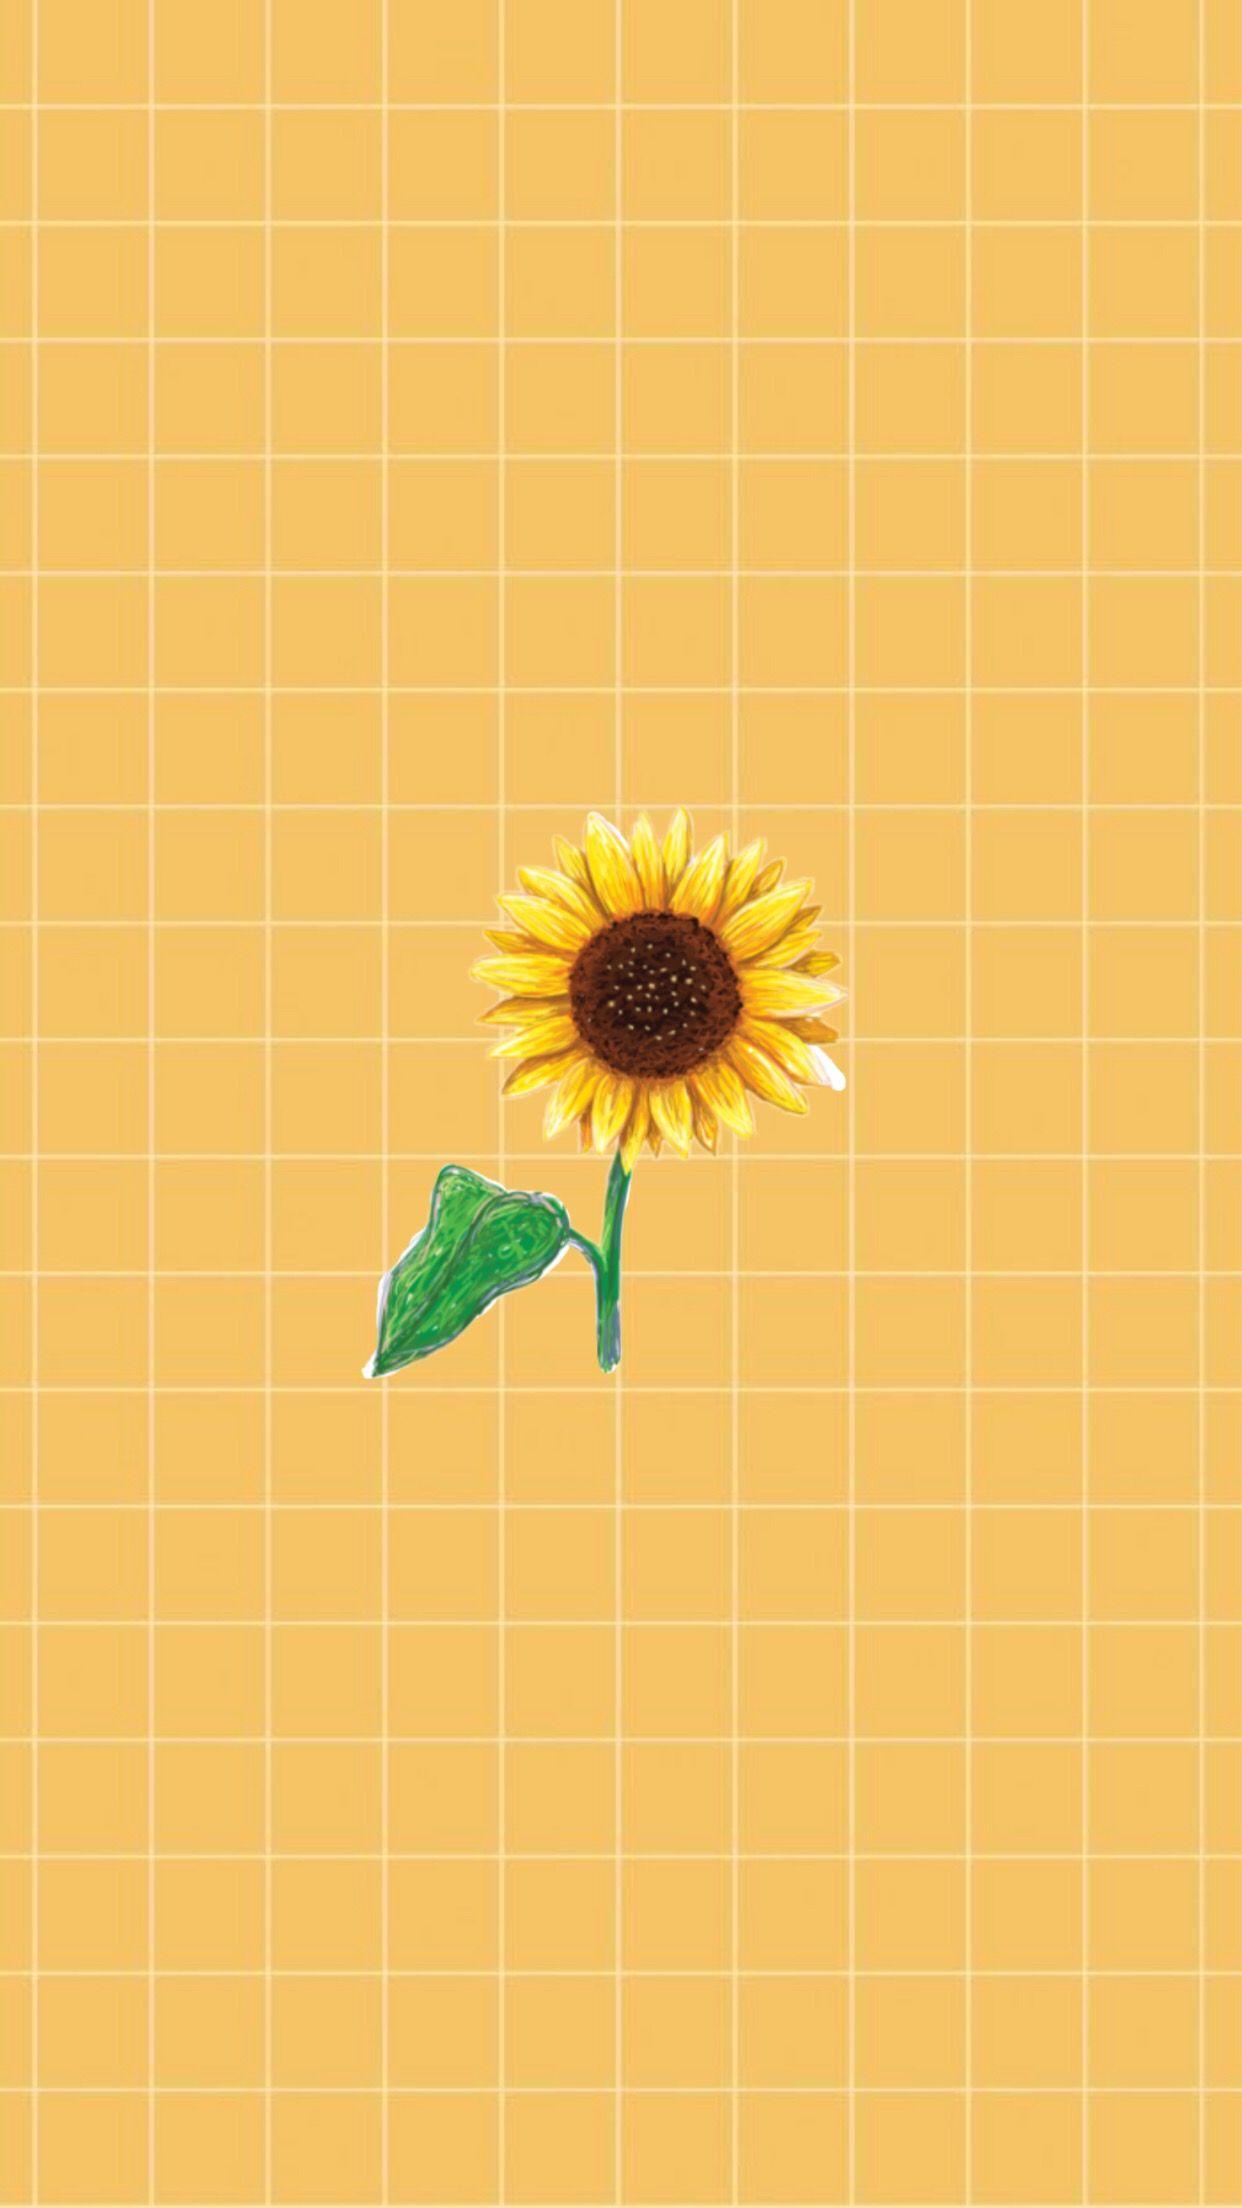 Tumblr wallpaper Yellow Sunflower | Wallpaper | Sunflower wallpaper, Grid wallpaper, Iphone ...